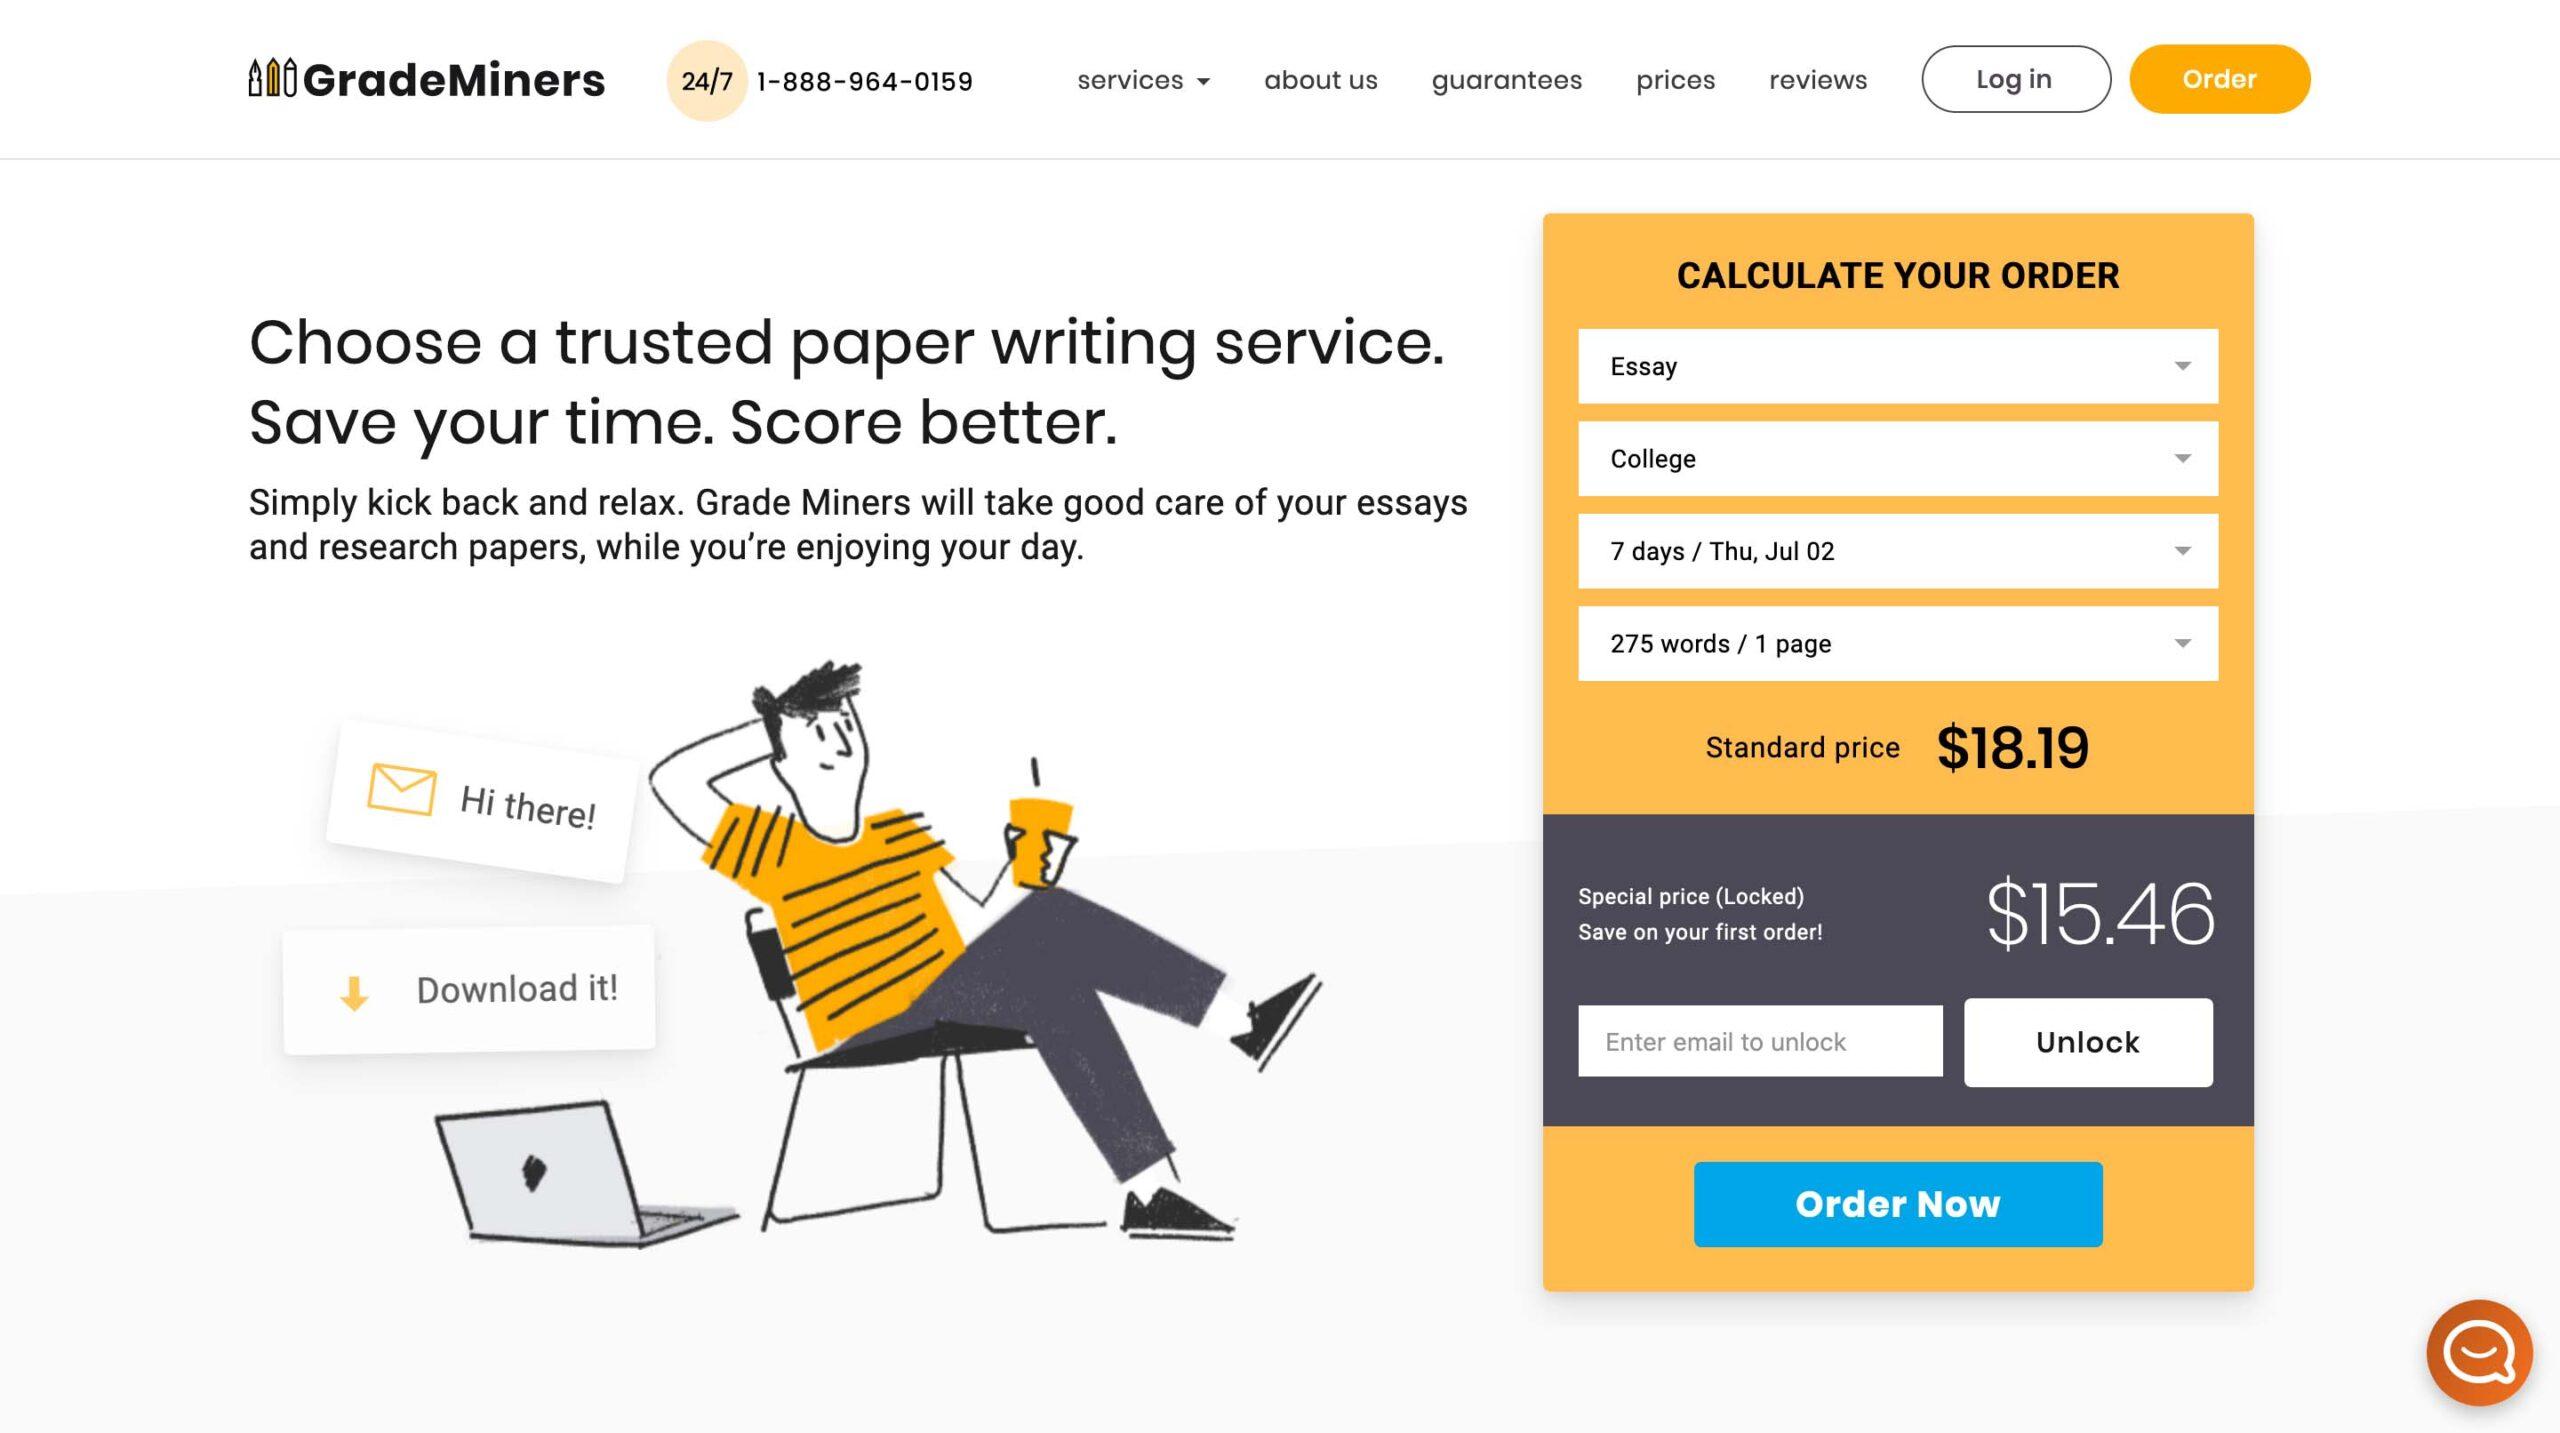 GradeMiners.com website